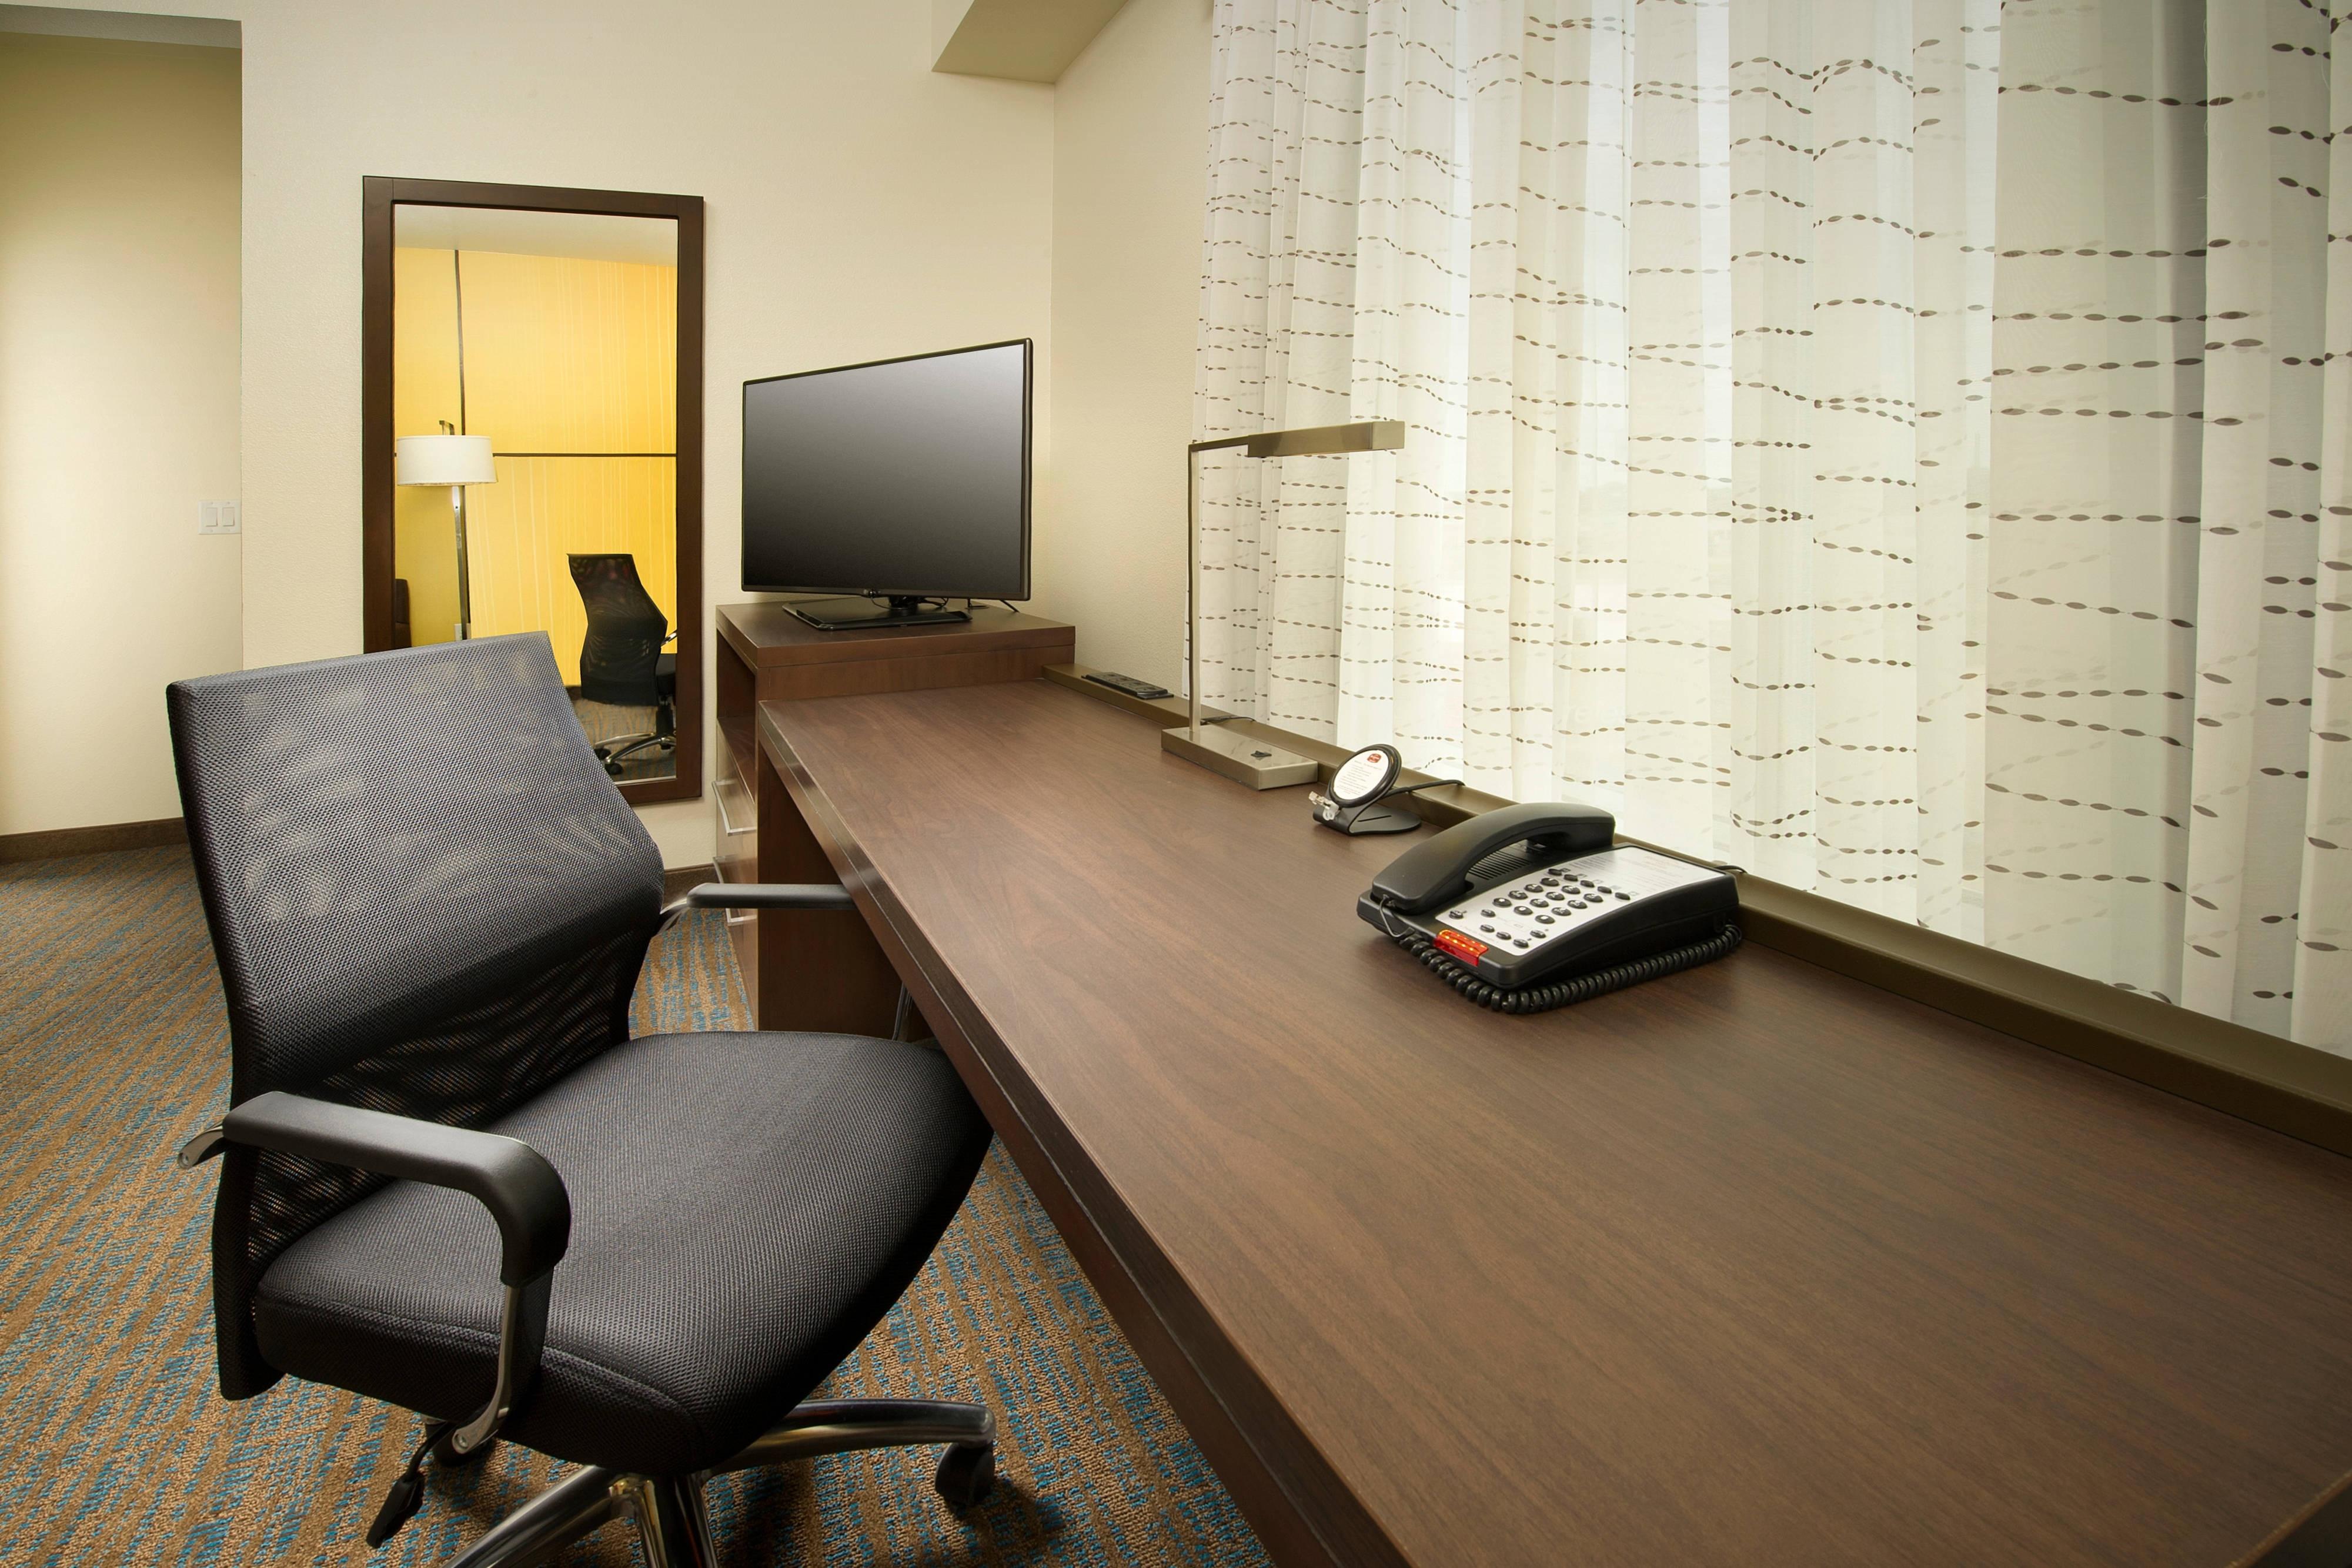 Tyler Texas Hotel Desk Area